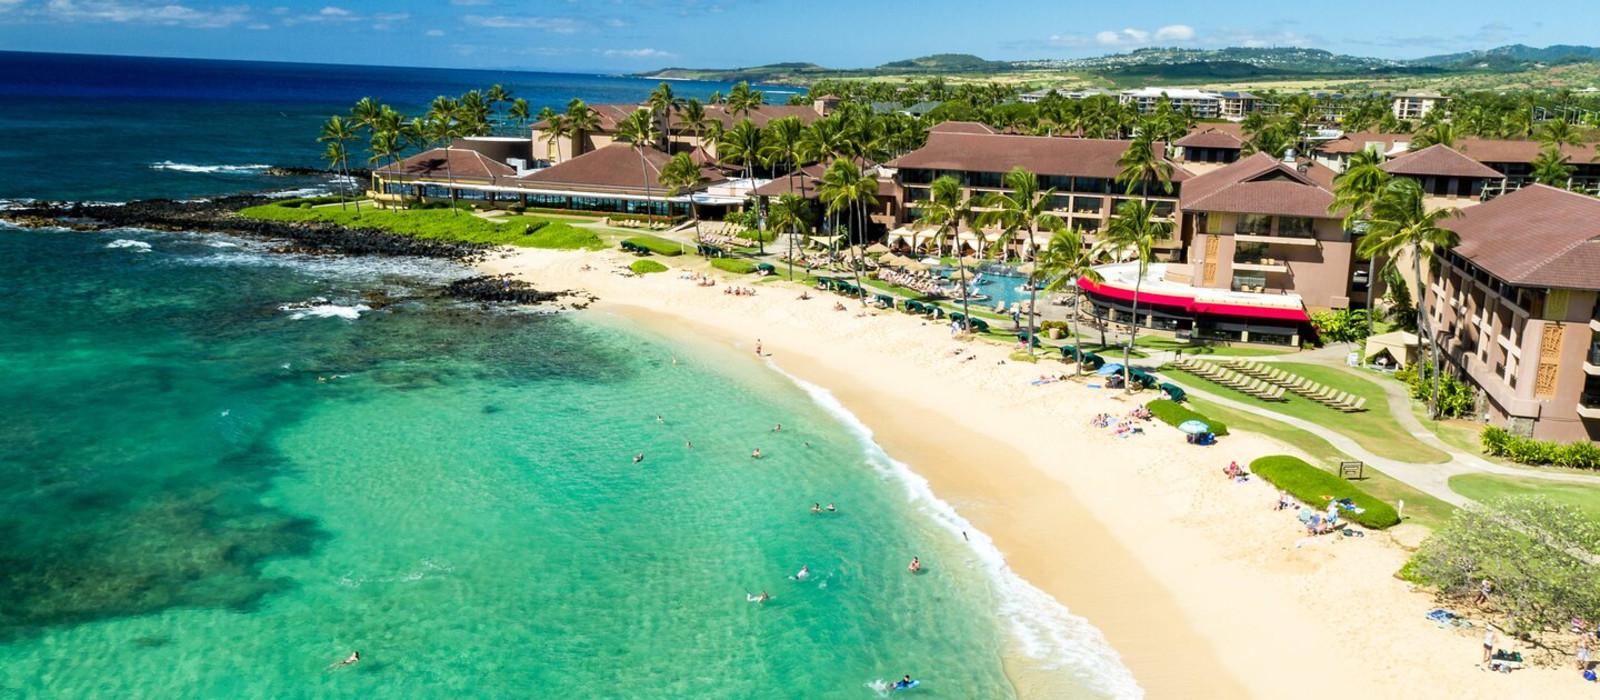 Hotel Sheraton Kauai Resort Hawaii